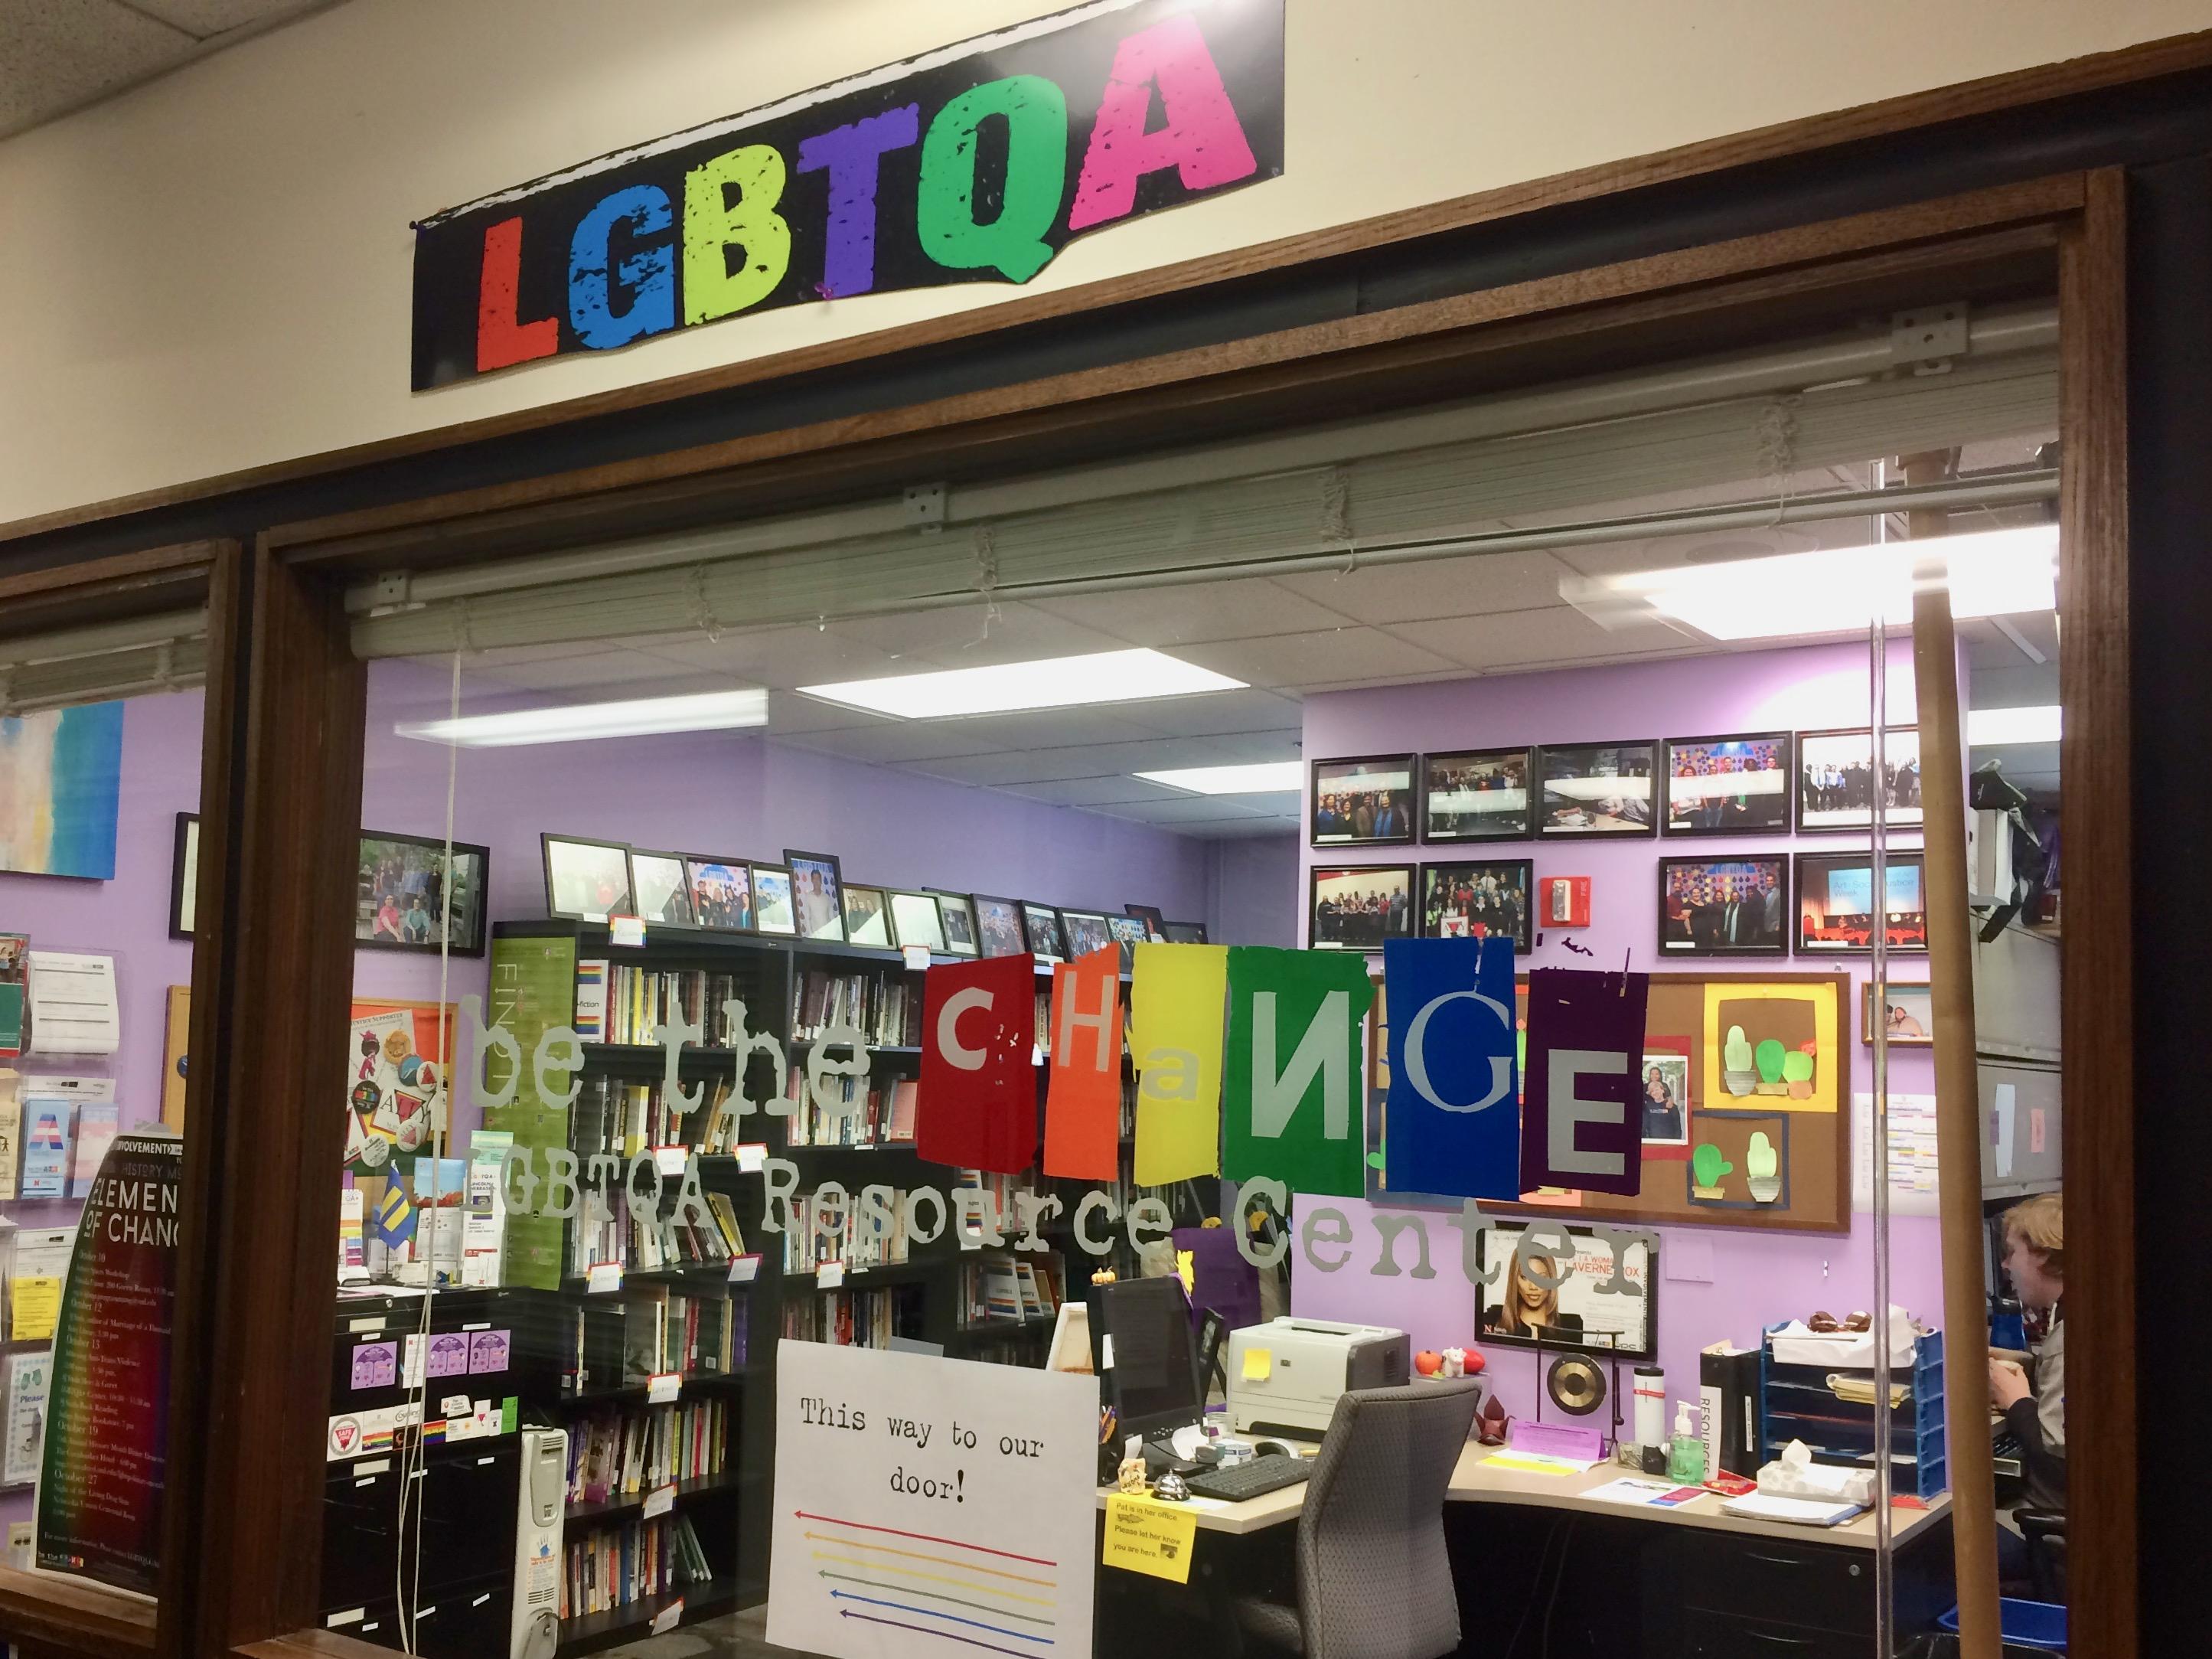 LGBTQA+ Resource Center at the University of Nebraska-Lincoln